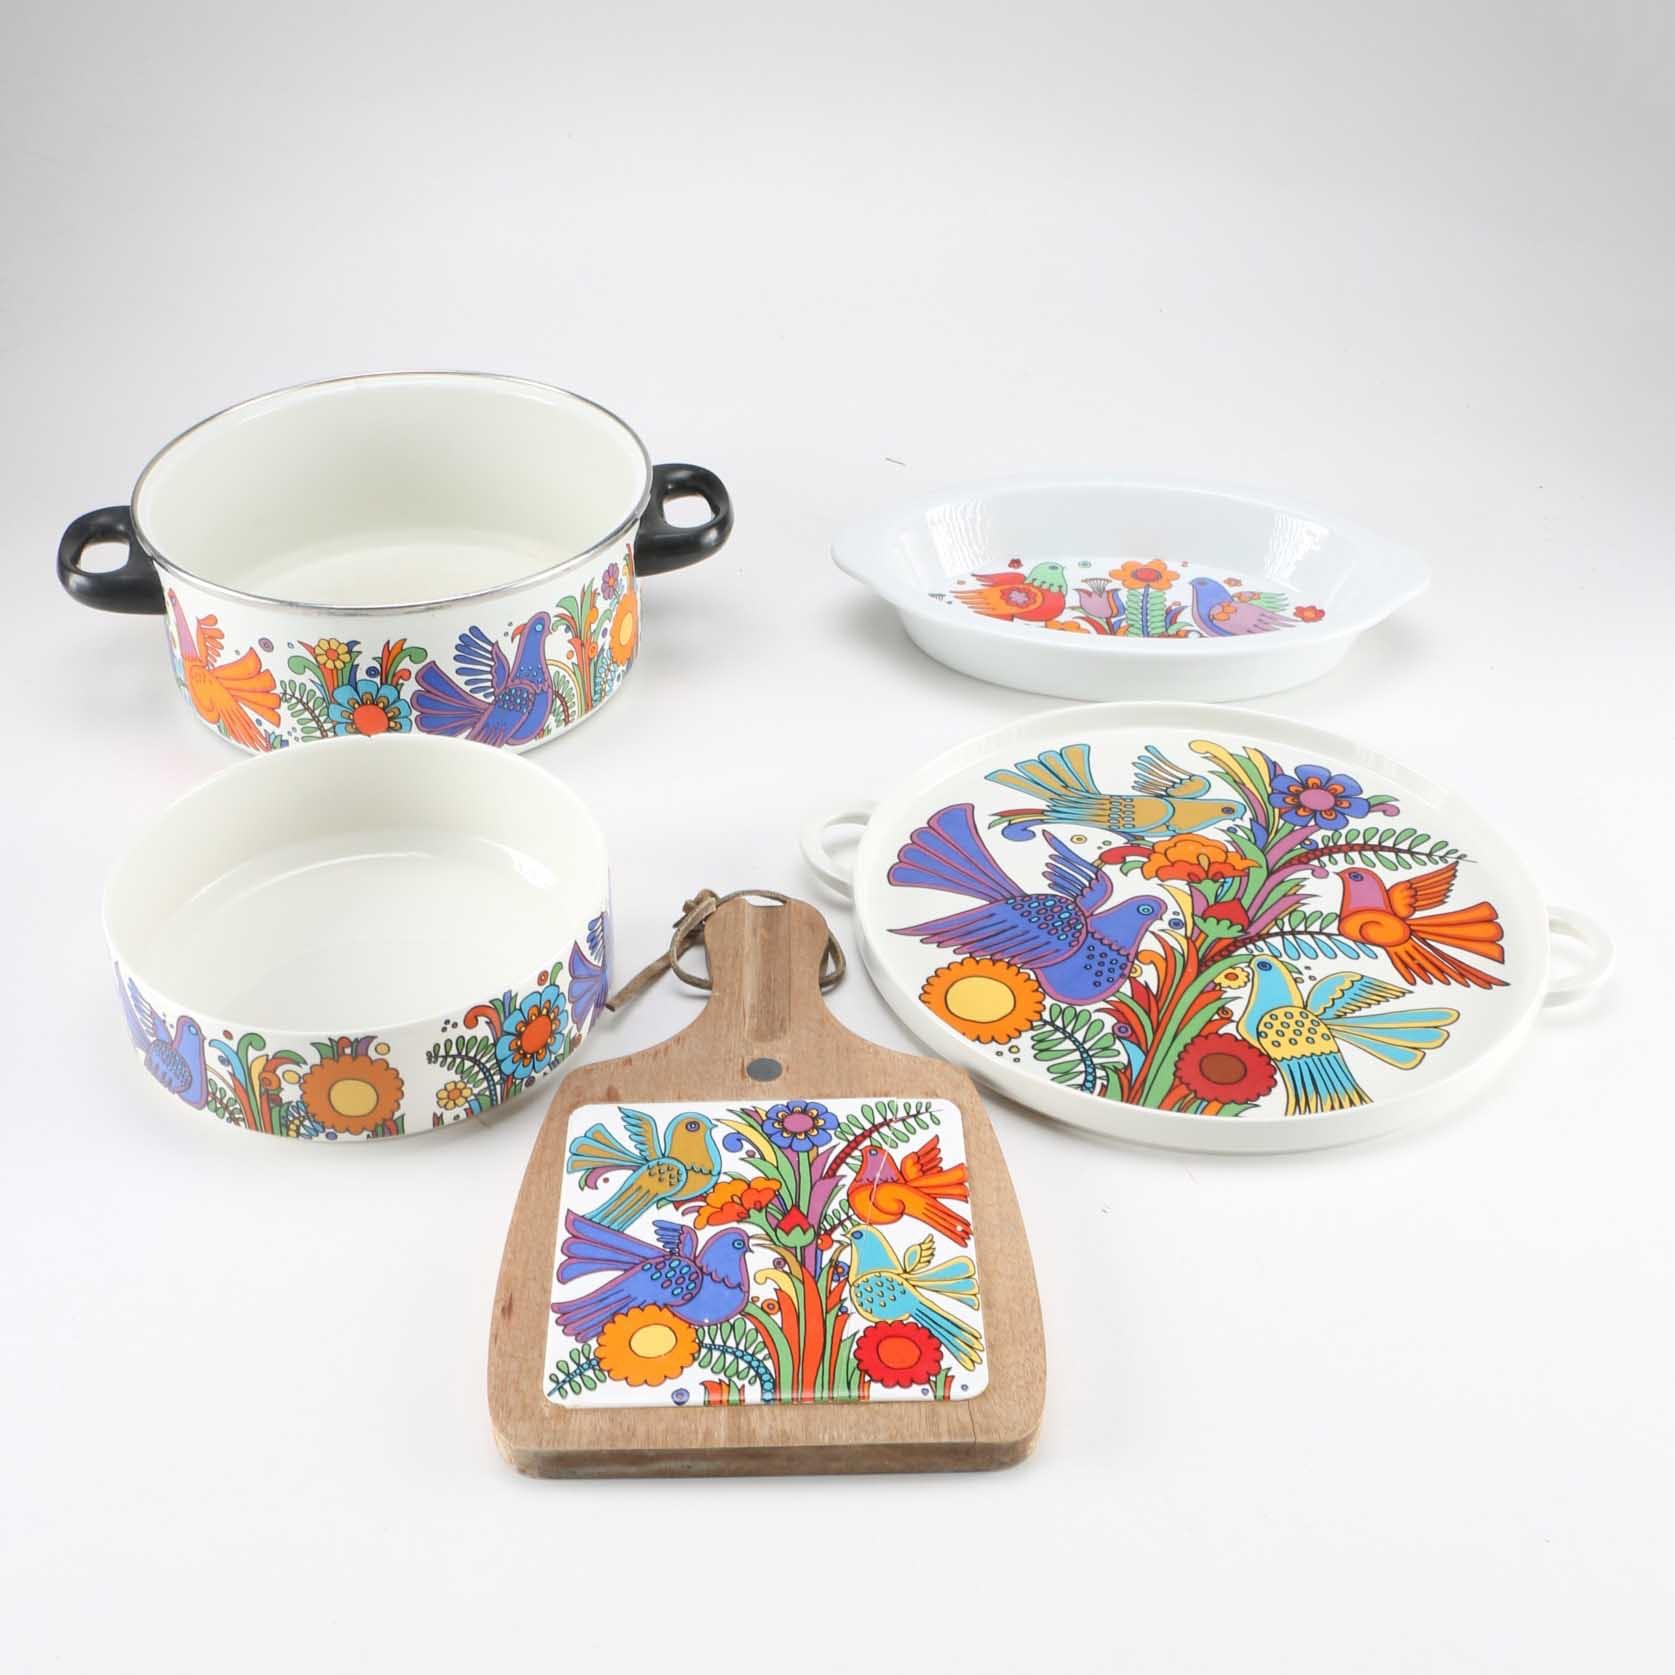 Villeroy u0026 Boch  Acapulco  Porcelain Dishes with ... & Villeroy u0026 Boch